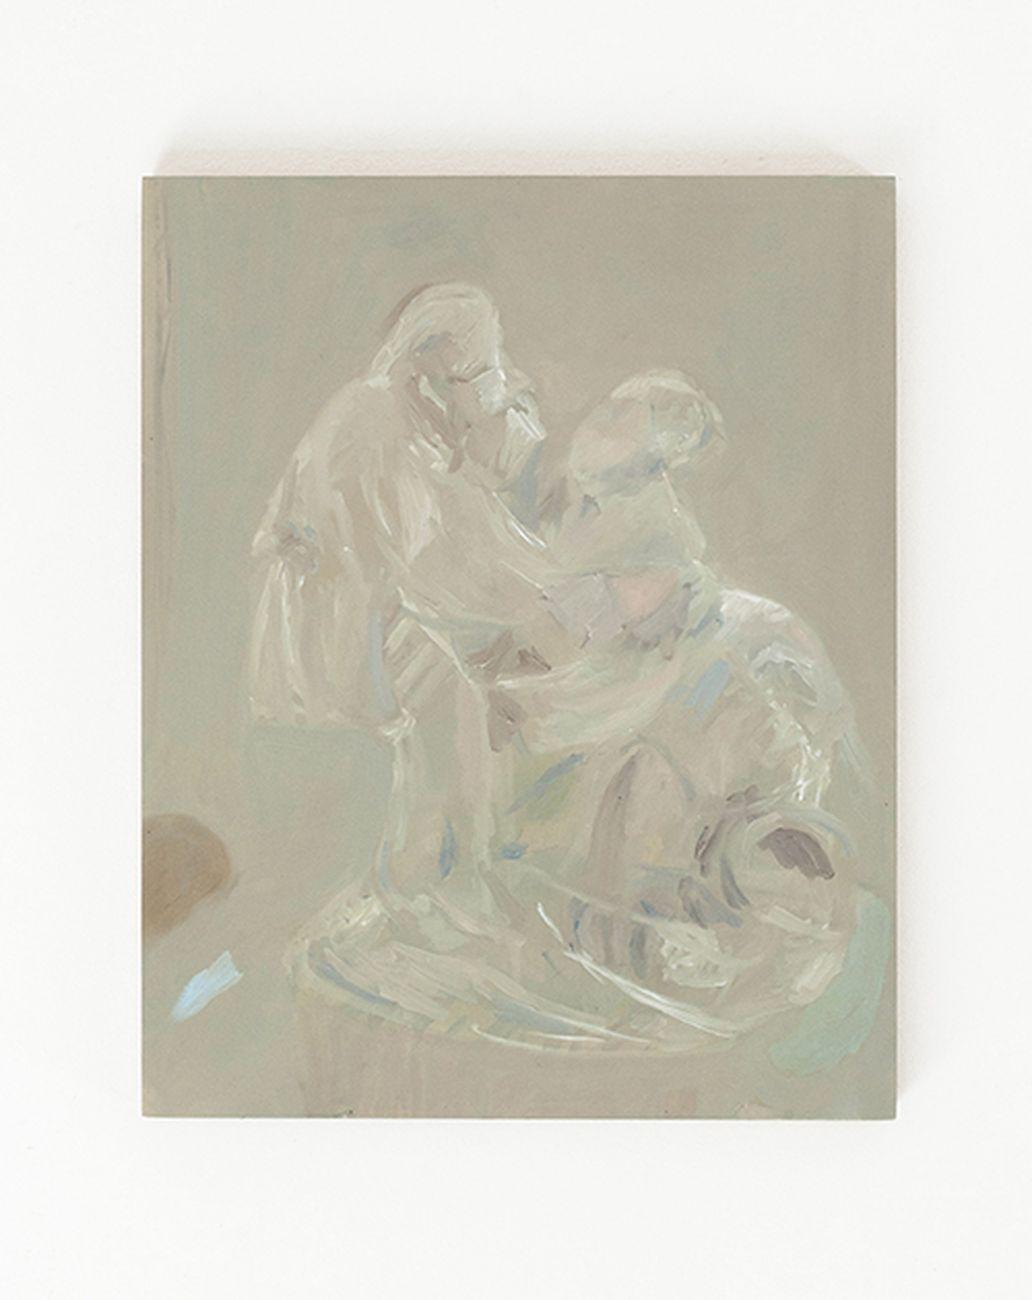 Beatrice Meoni, felici i felici, 2018